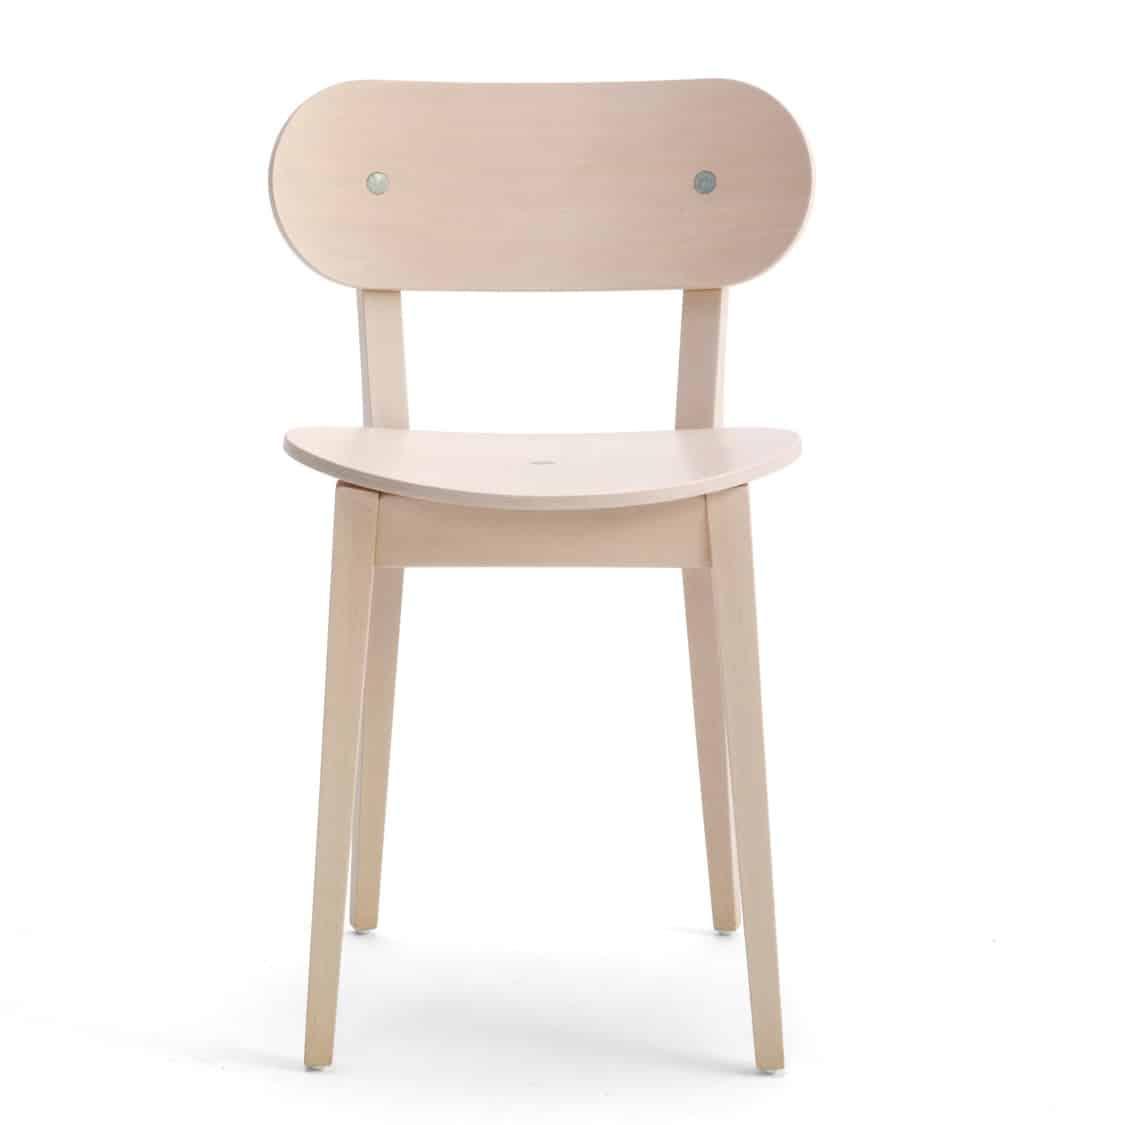 Grady Side Chair Gradisca Billiani Wooden DeFrae Contract Furniture